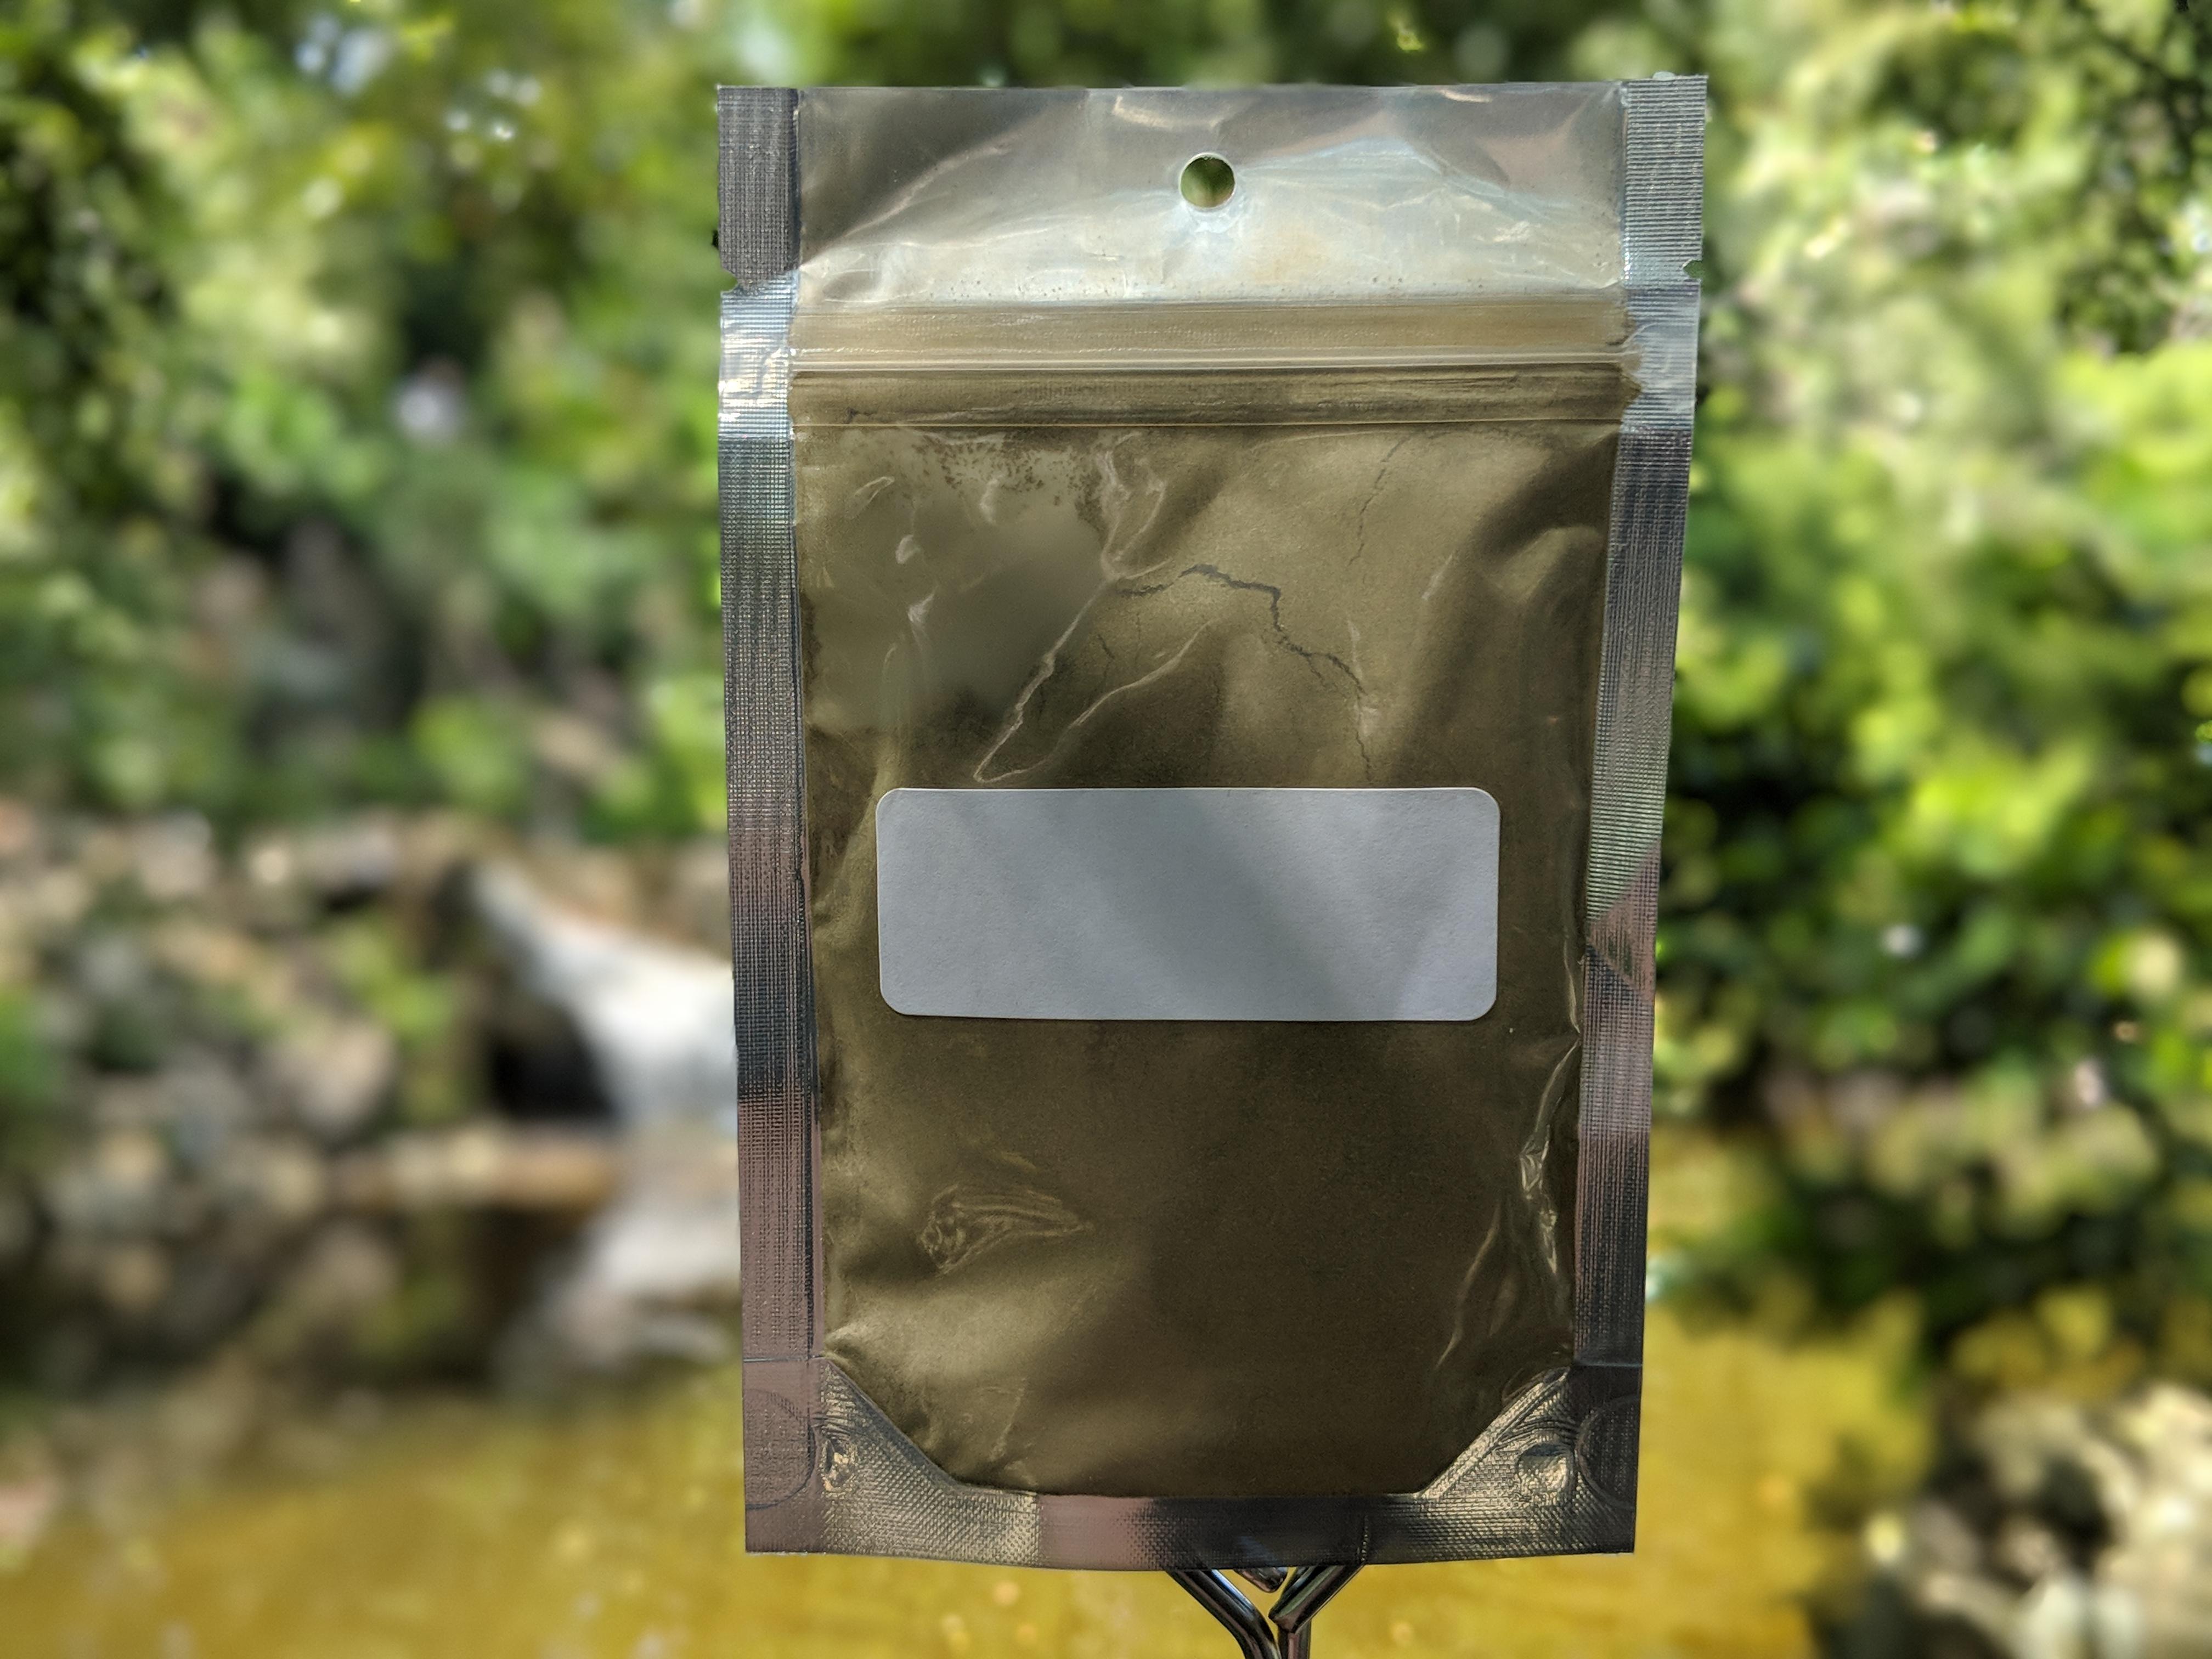 White Vein Vietnam Kratom powder for sale freeship usa